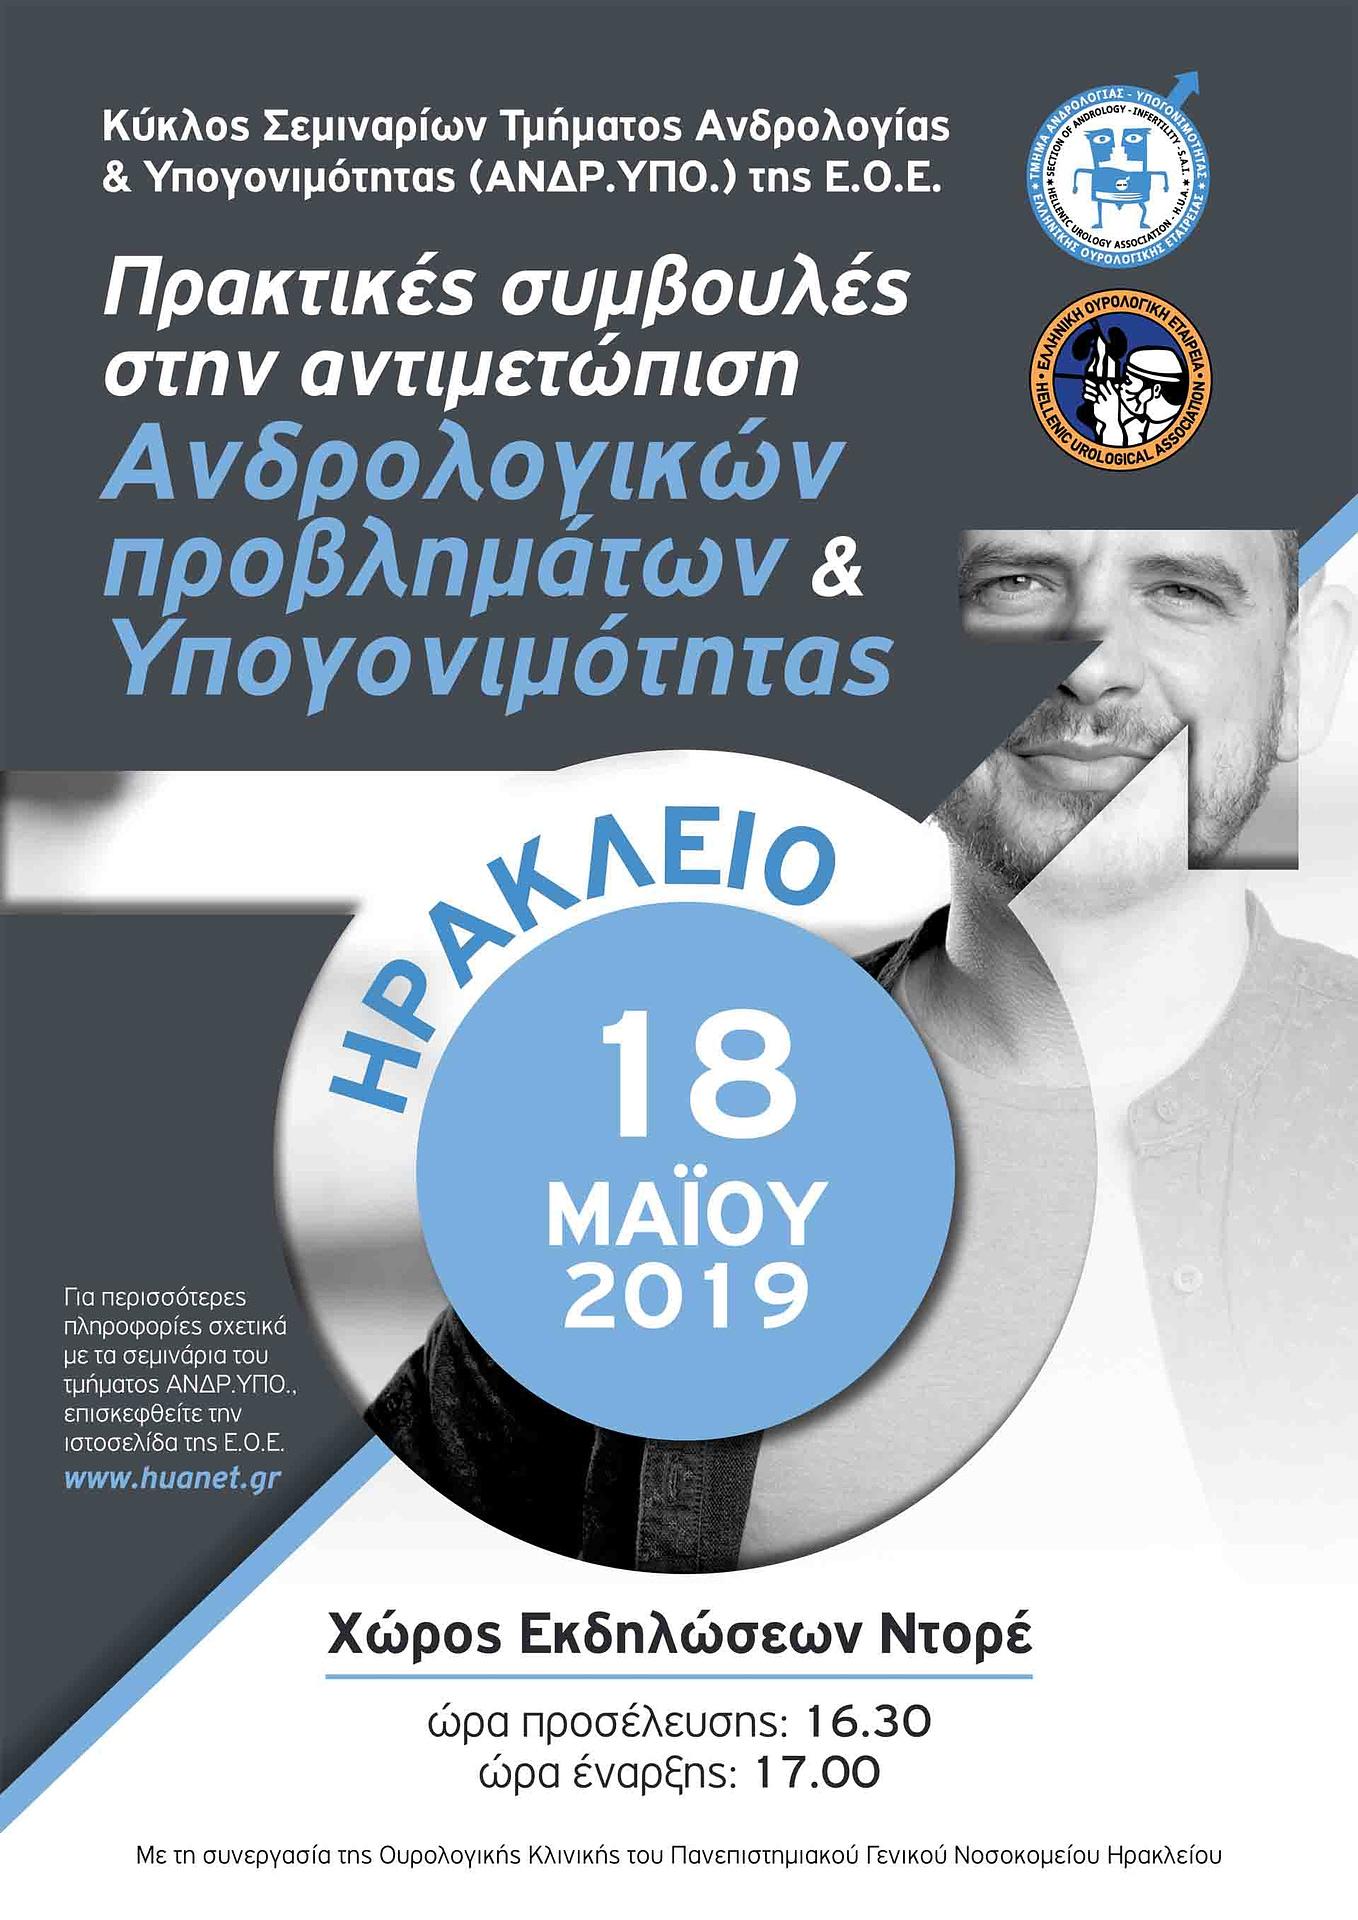 Seminario_Andrypo_Hrakleio May 2019_Poster A3